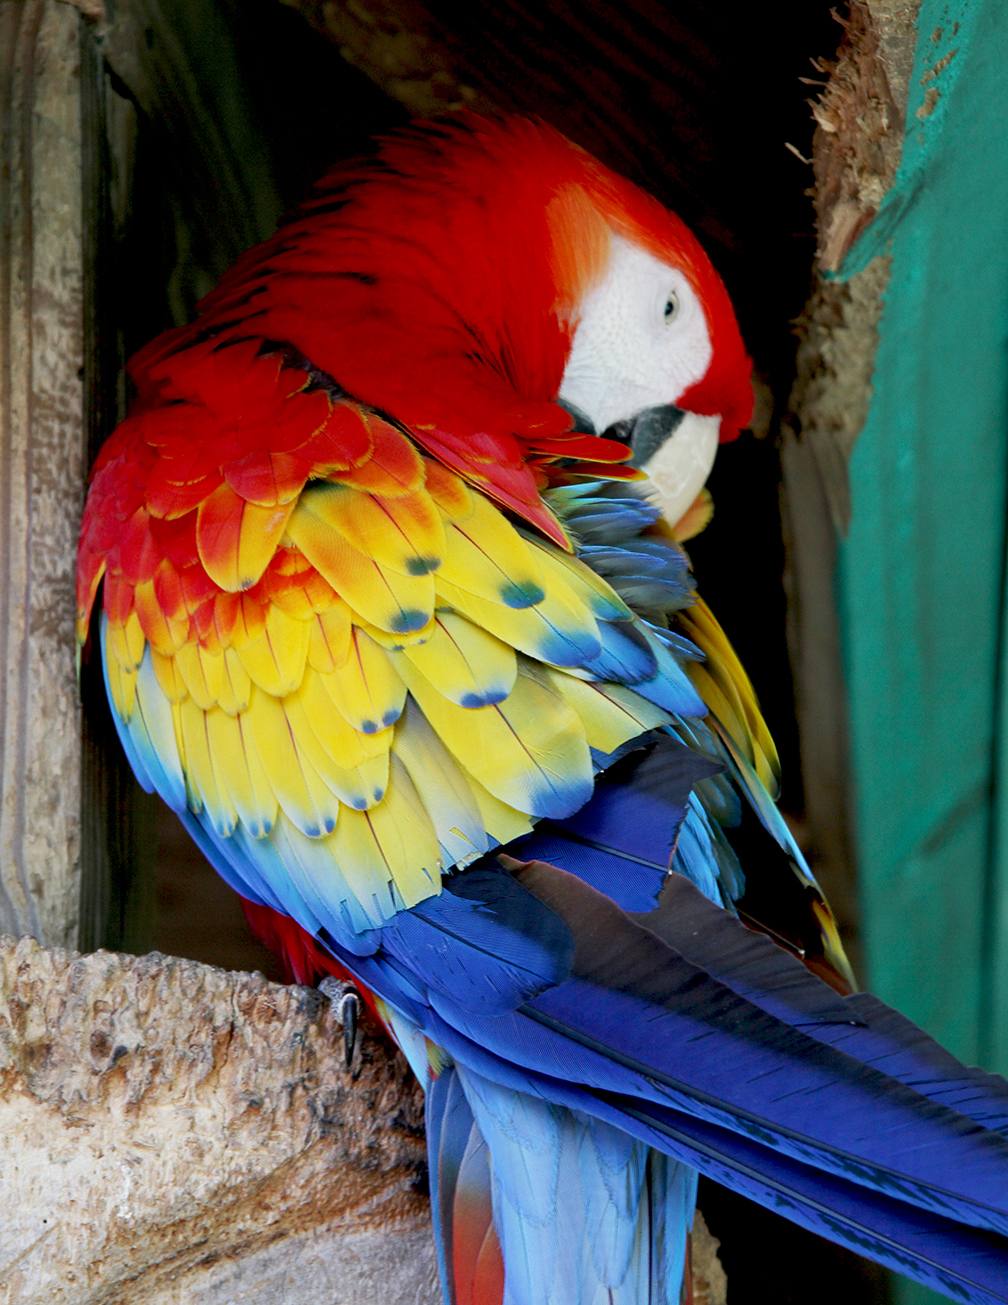 Parrot, Florida Everglades